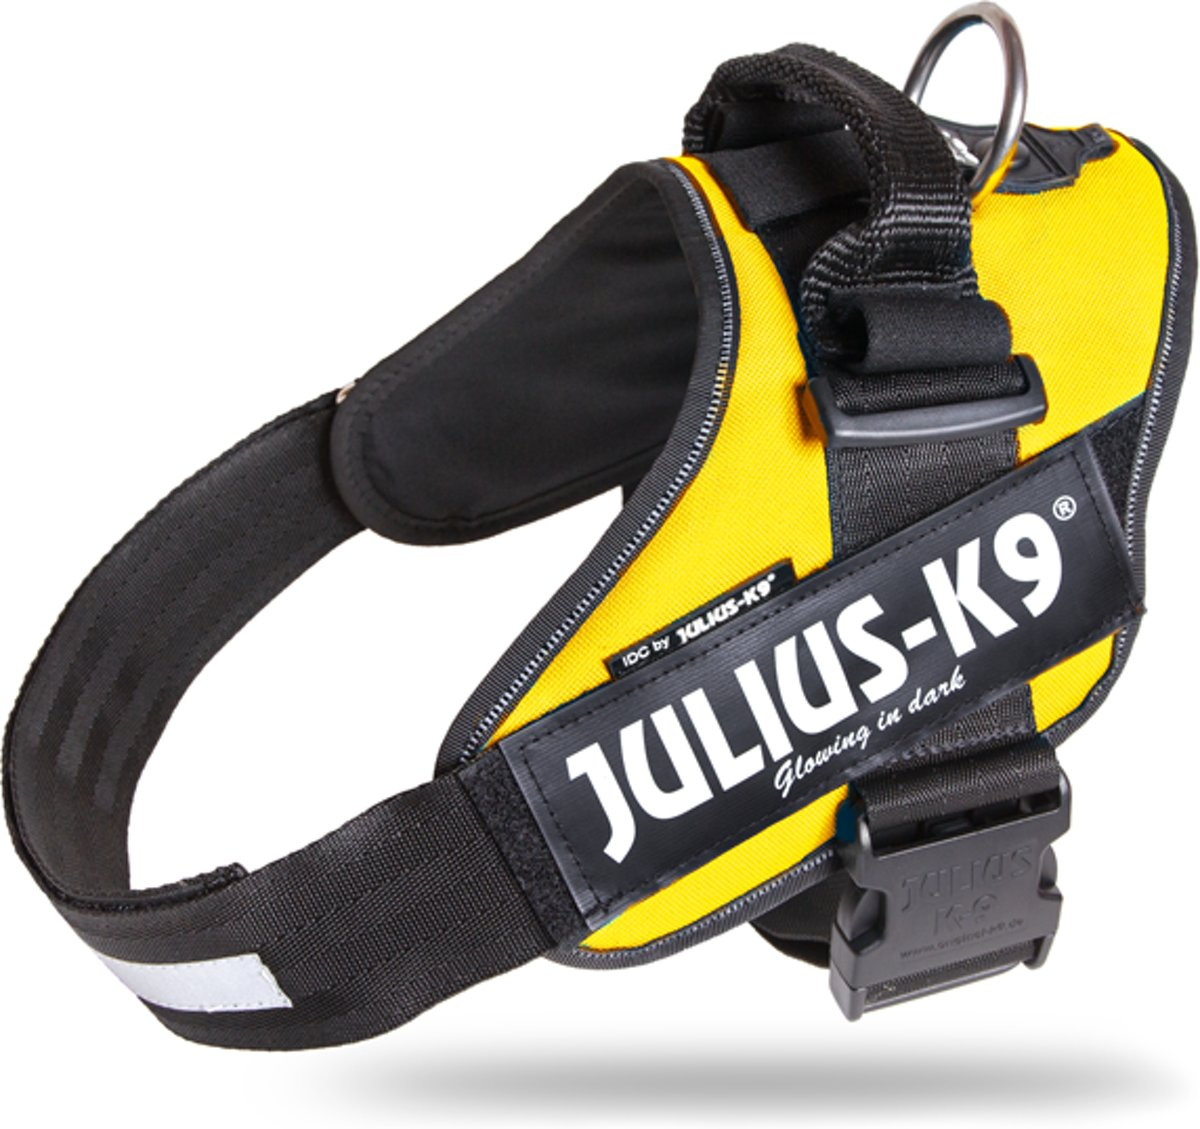 WERELD BEKENDE JULIUS K9 IDC POWERTUIG VOOR TEKSTLABELS SUN MAAT 0